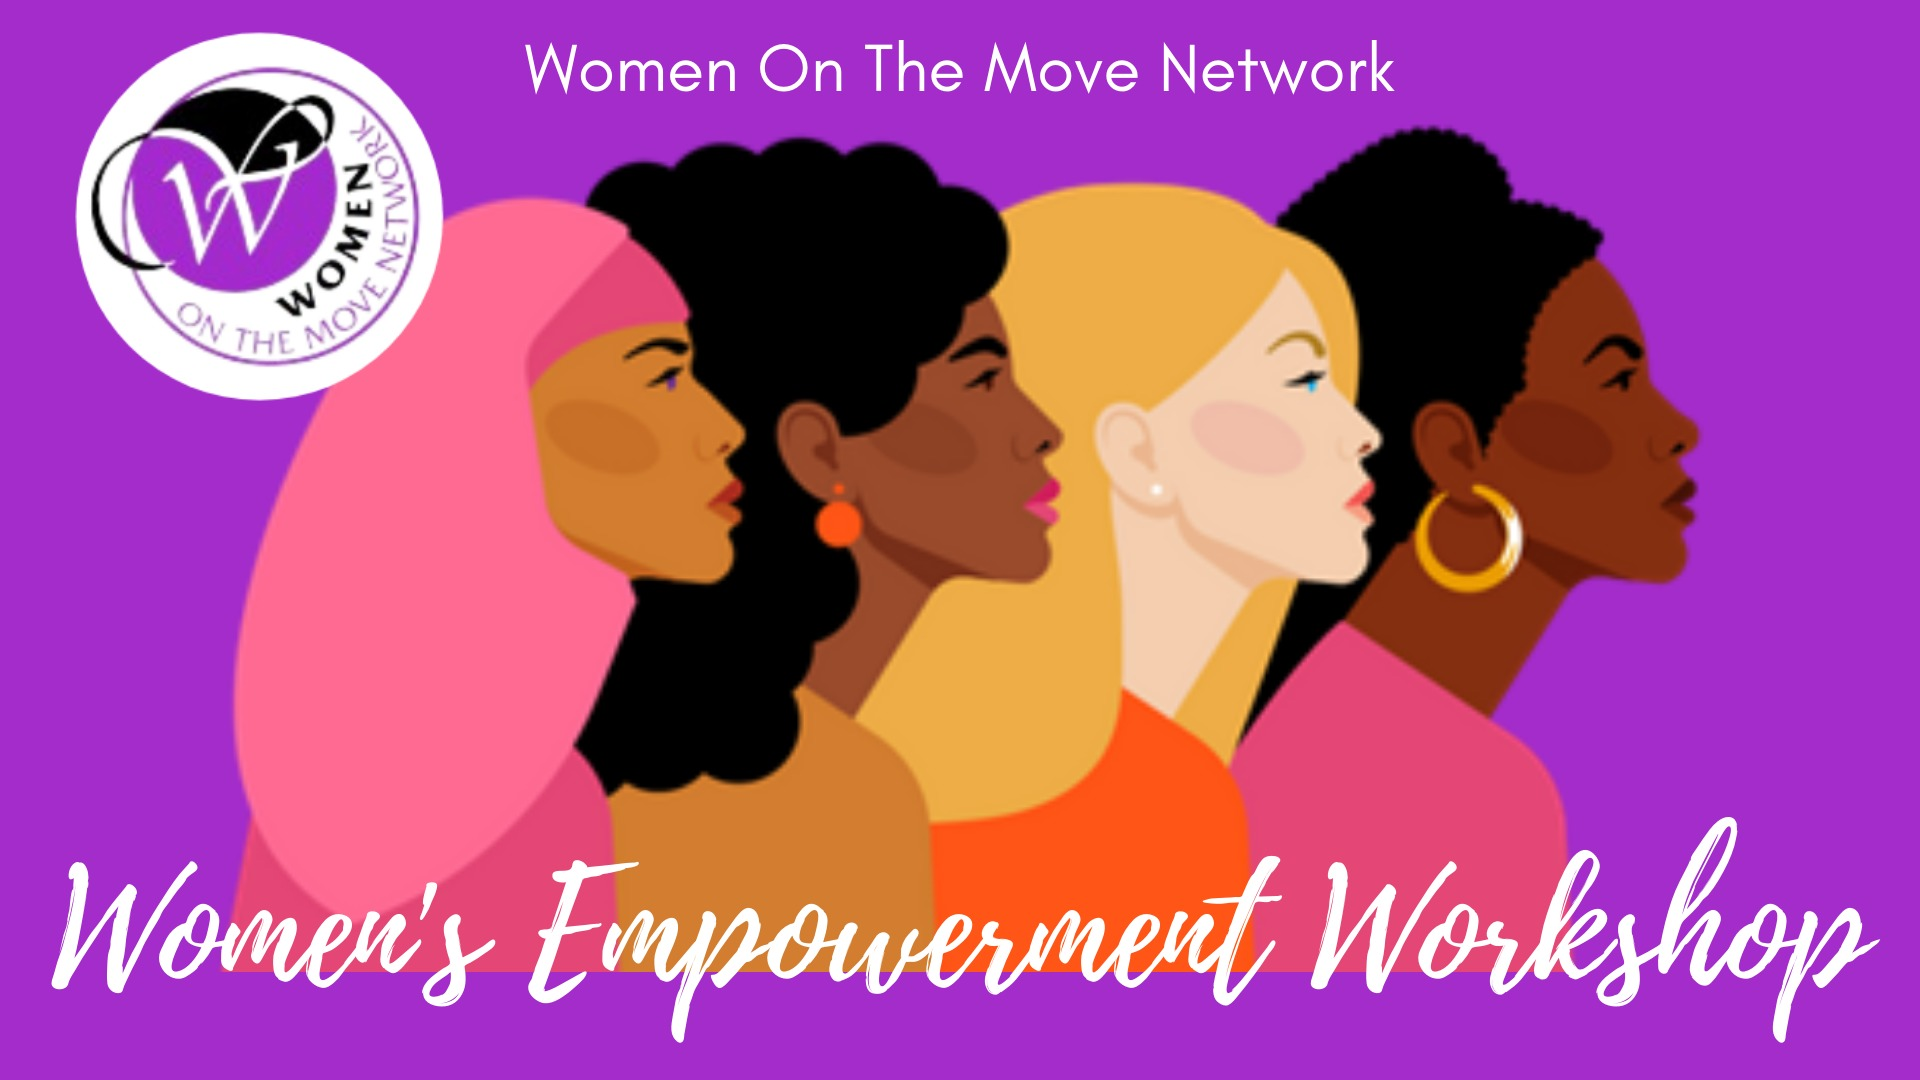 May 2021 Women's Empowerment Workshop